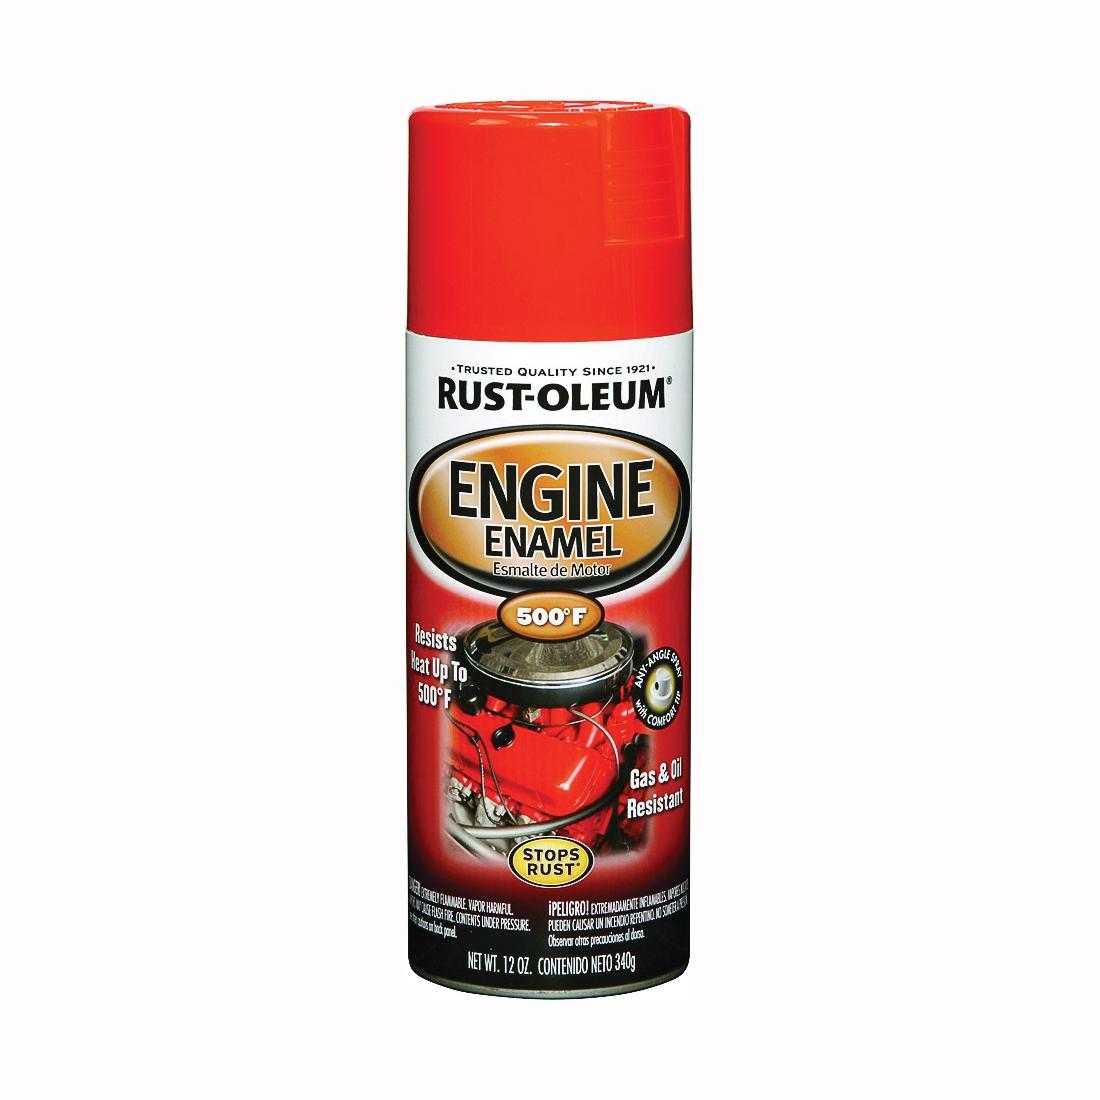 Picture of RUST-OLEUM AUTOMOTIVE 248941 Engine Enamel Spray Paint, Chevy Orange, 12 oz, Aerosol Can